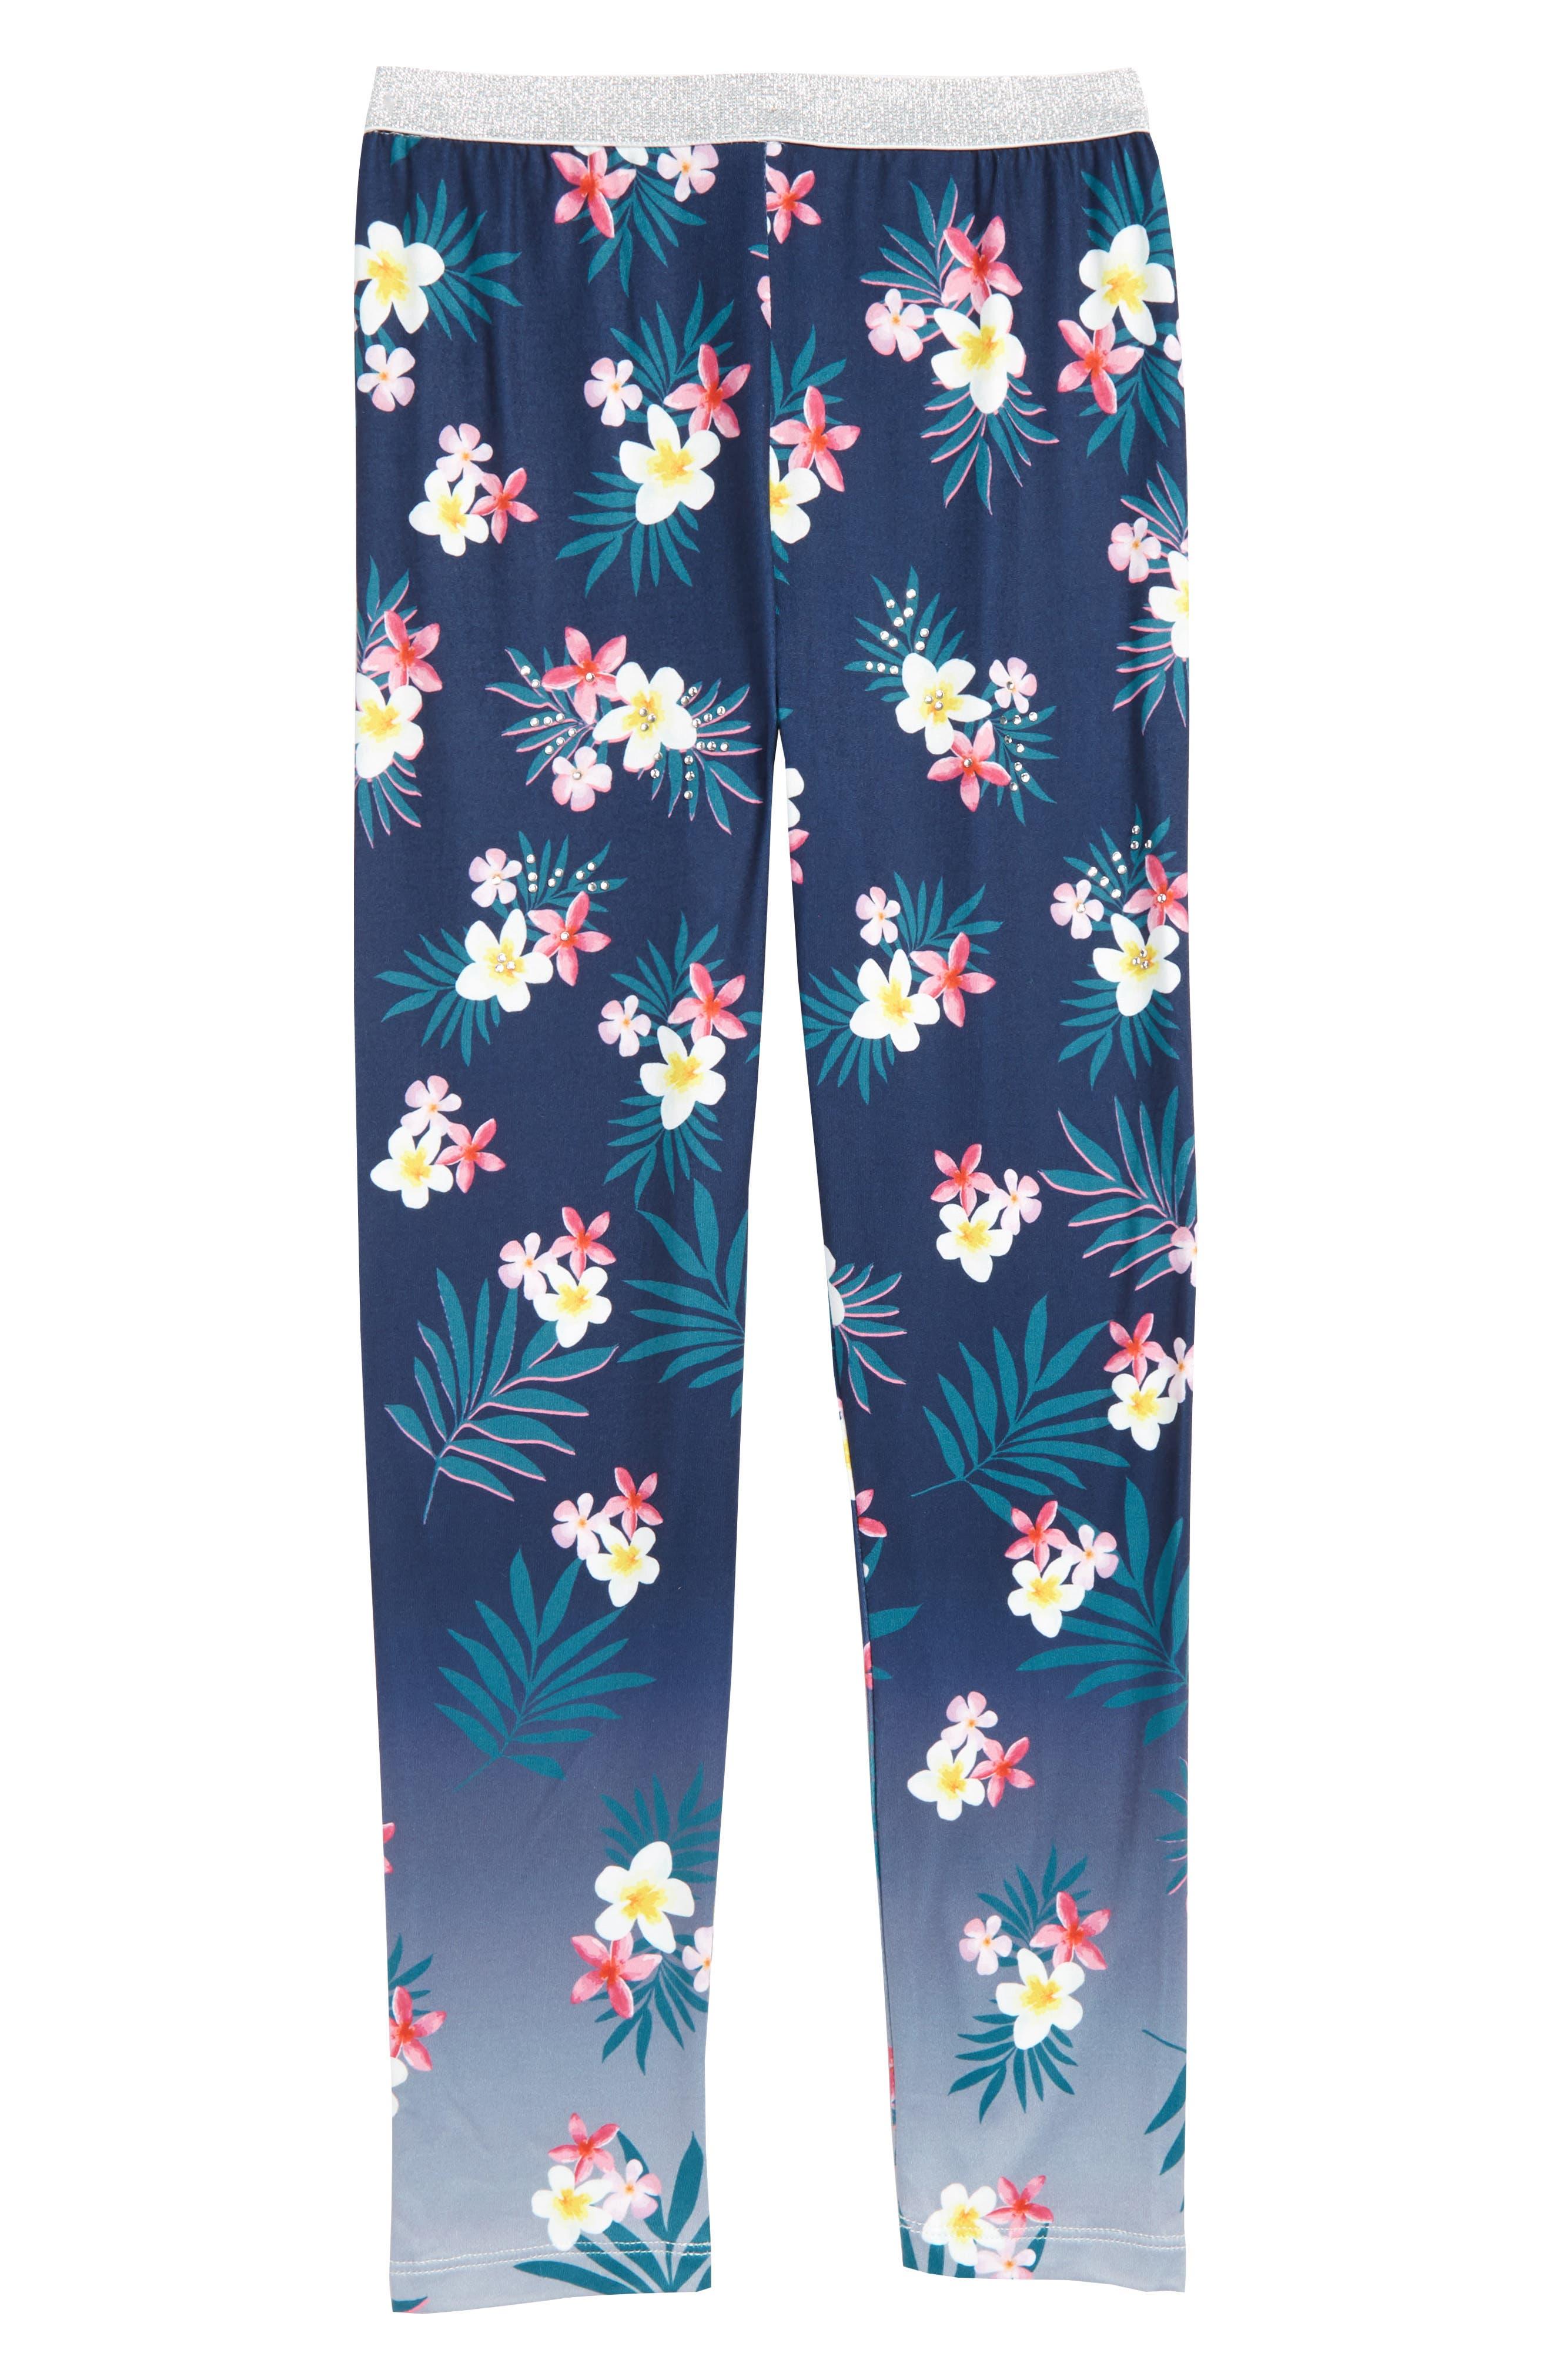 Embellished Floral Print Leggings,                             Main thumbnail 1, color,                             418